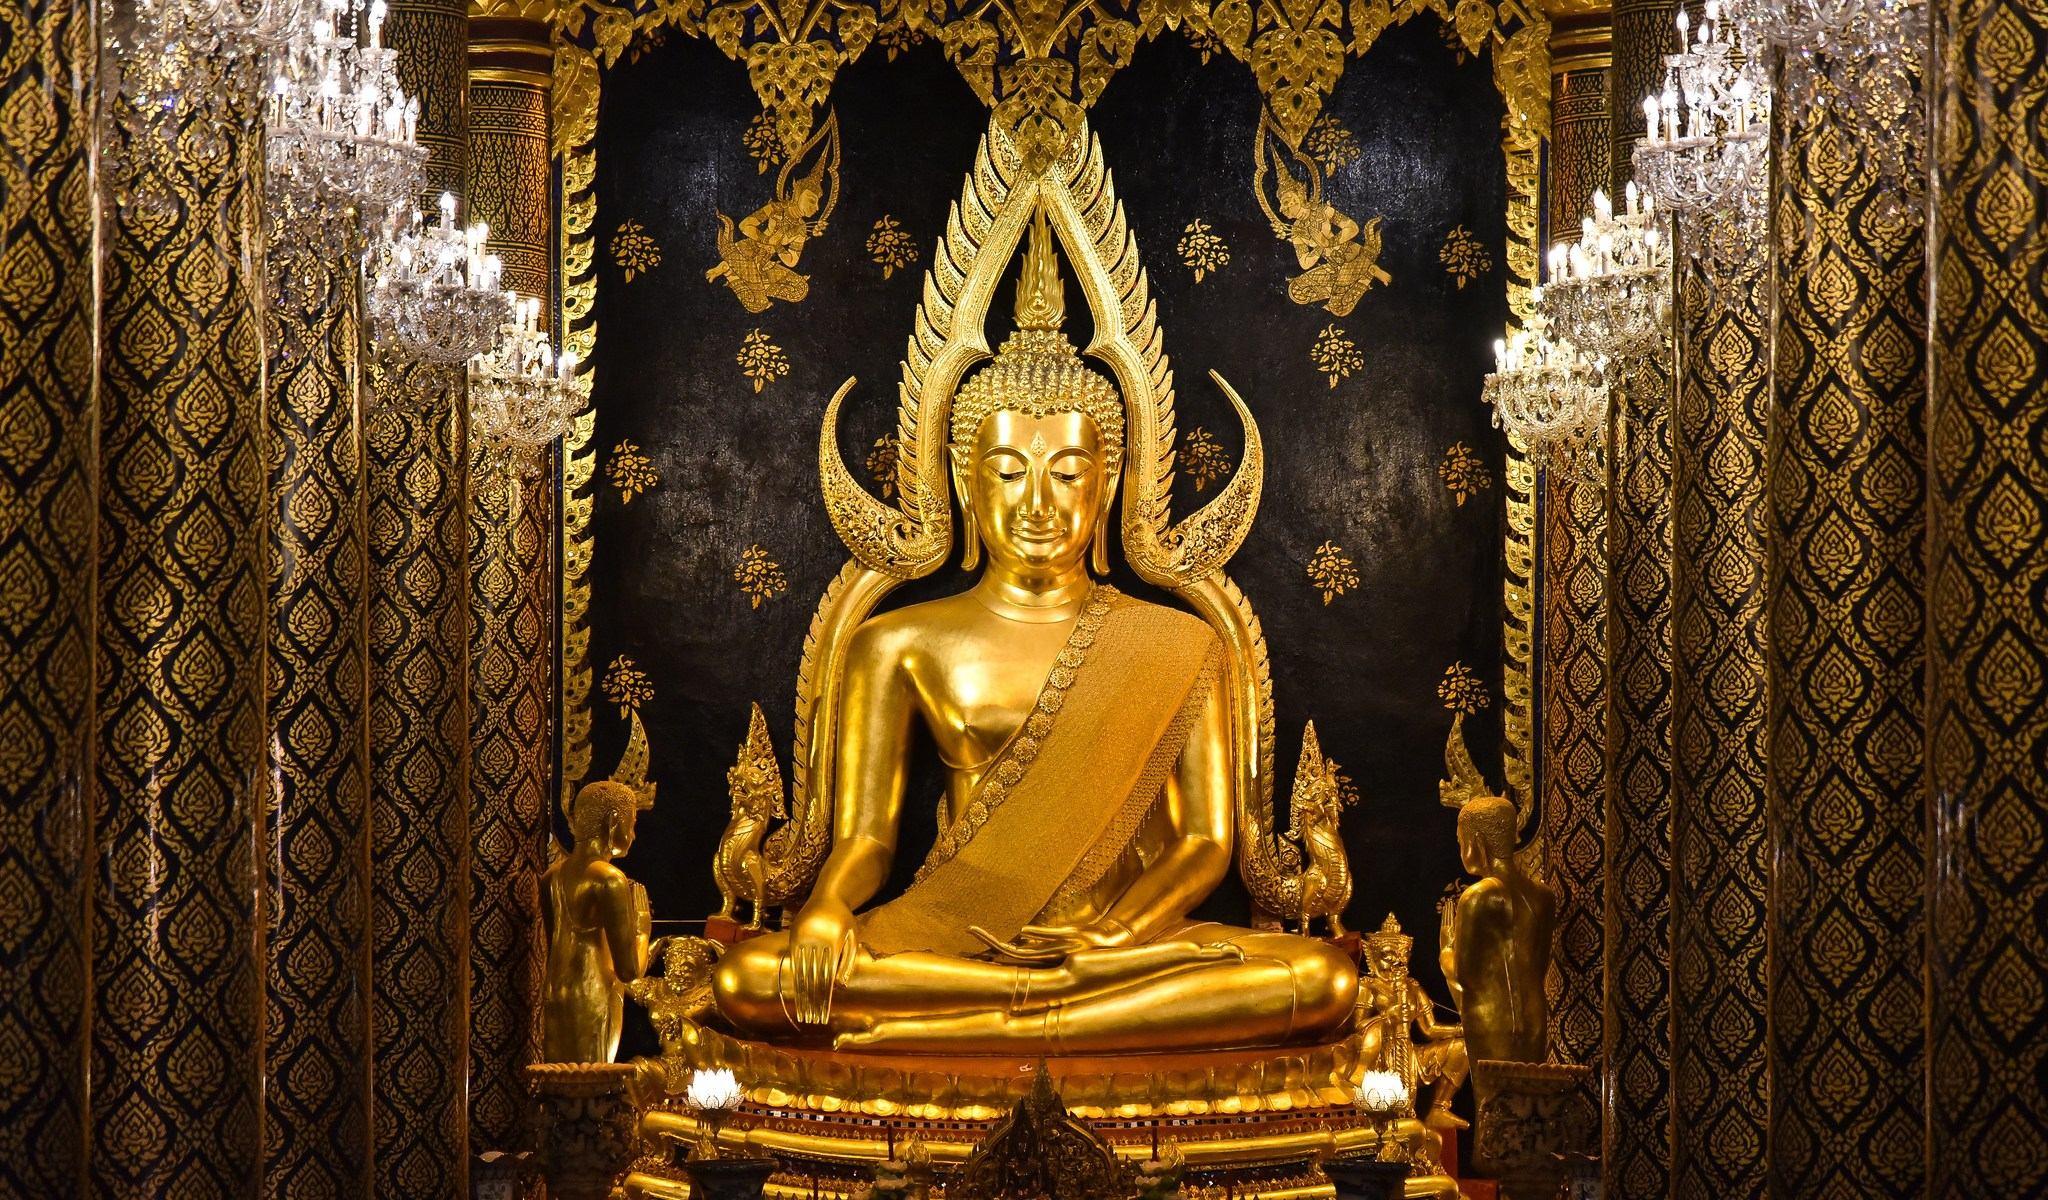 Phra Buddha Chinnarat in Wat Yai